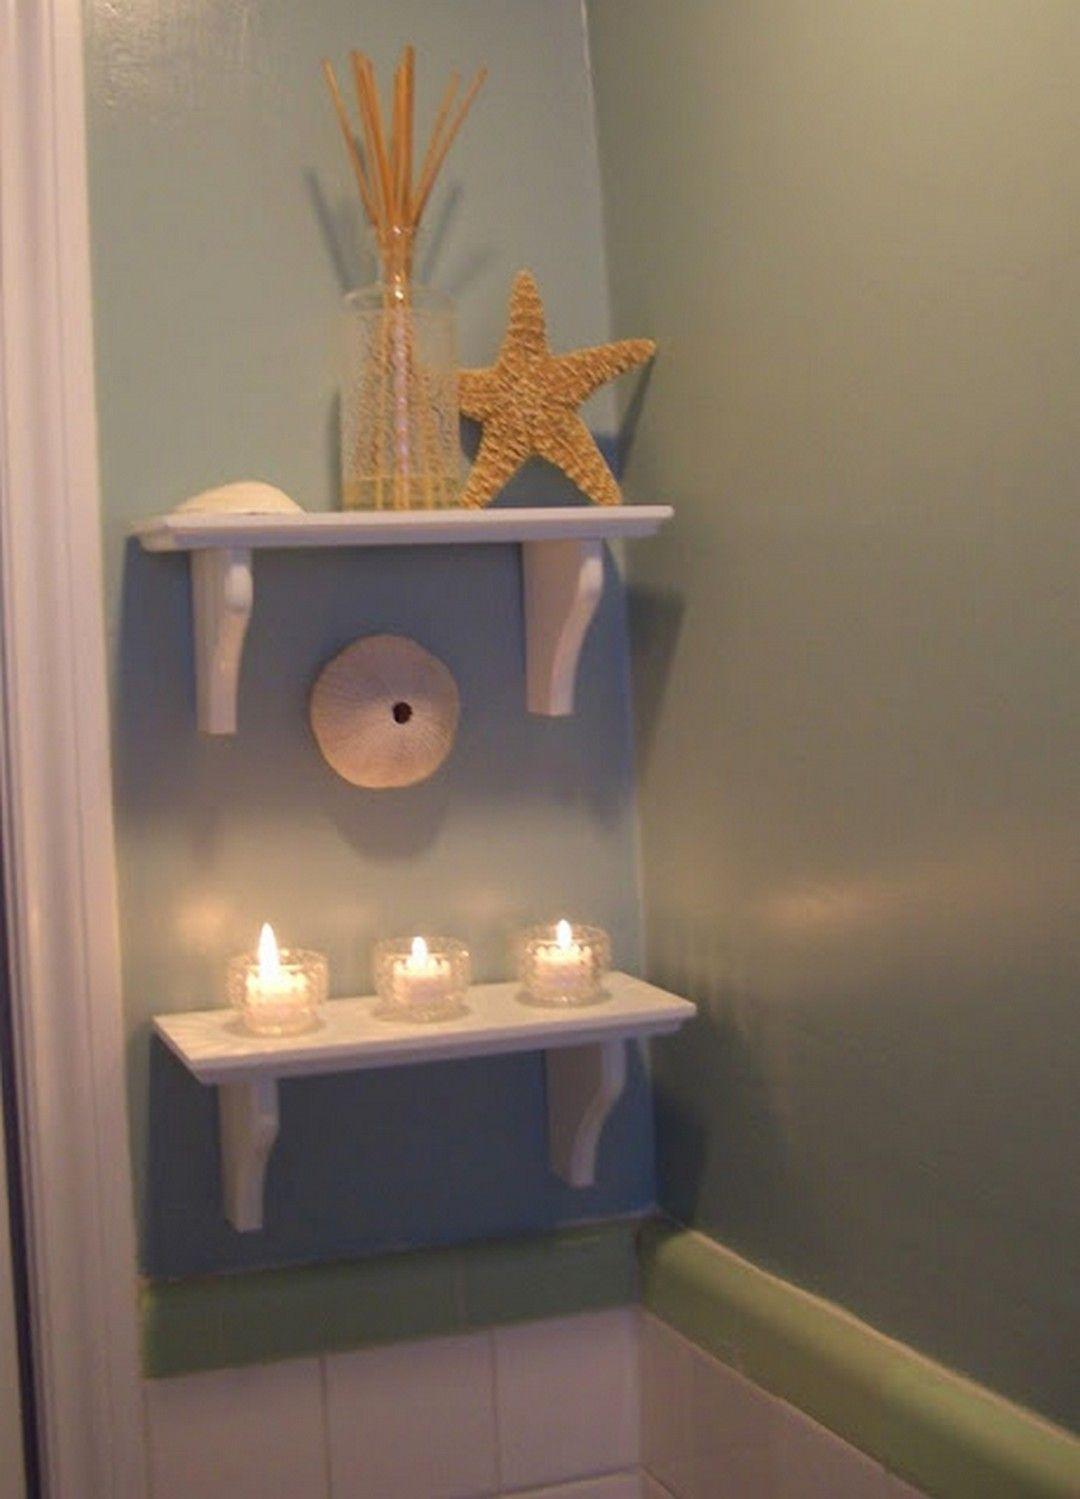 110 Adorable Shabby Chic Bathroom Decorating Ideas